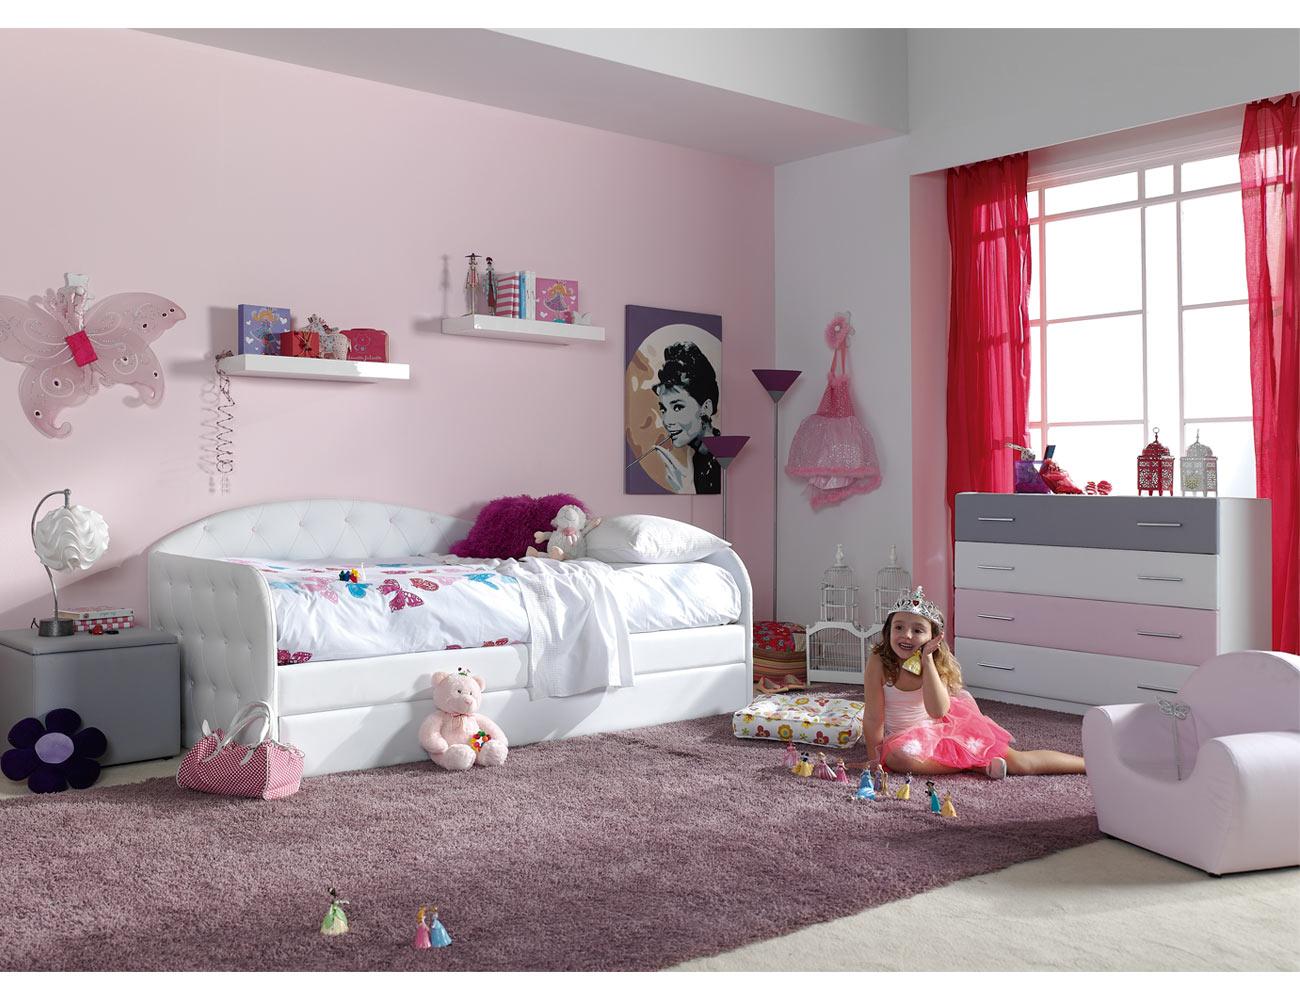 243 cama nido1